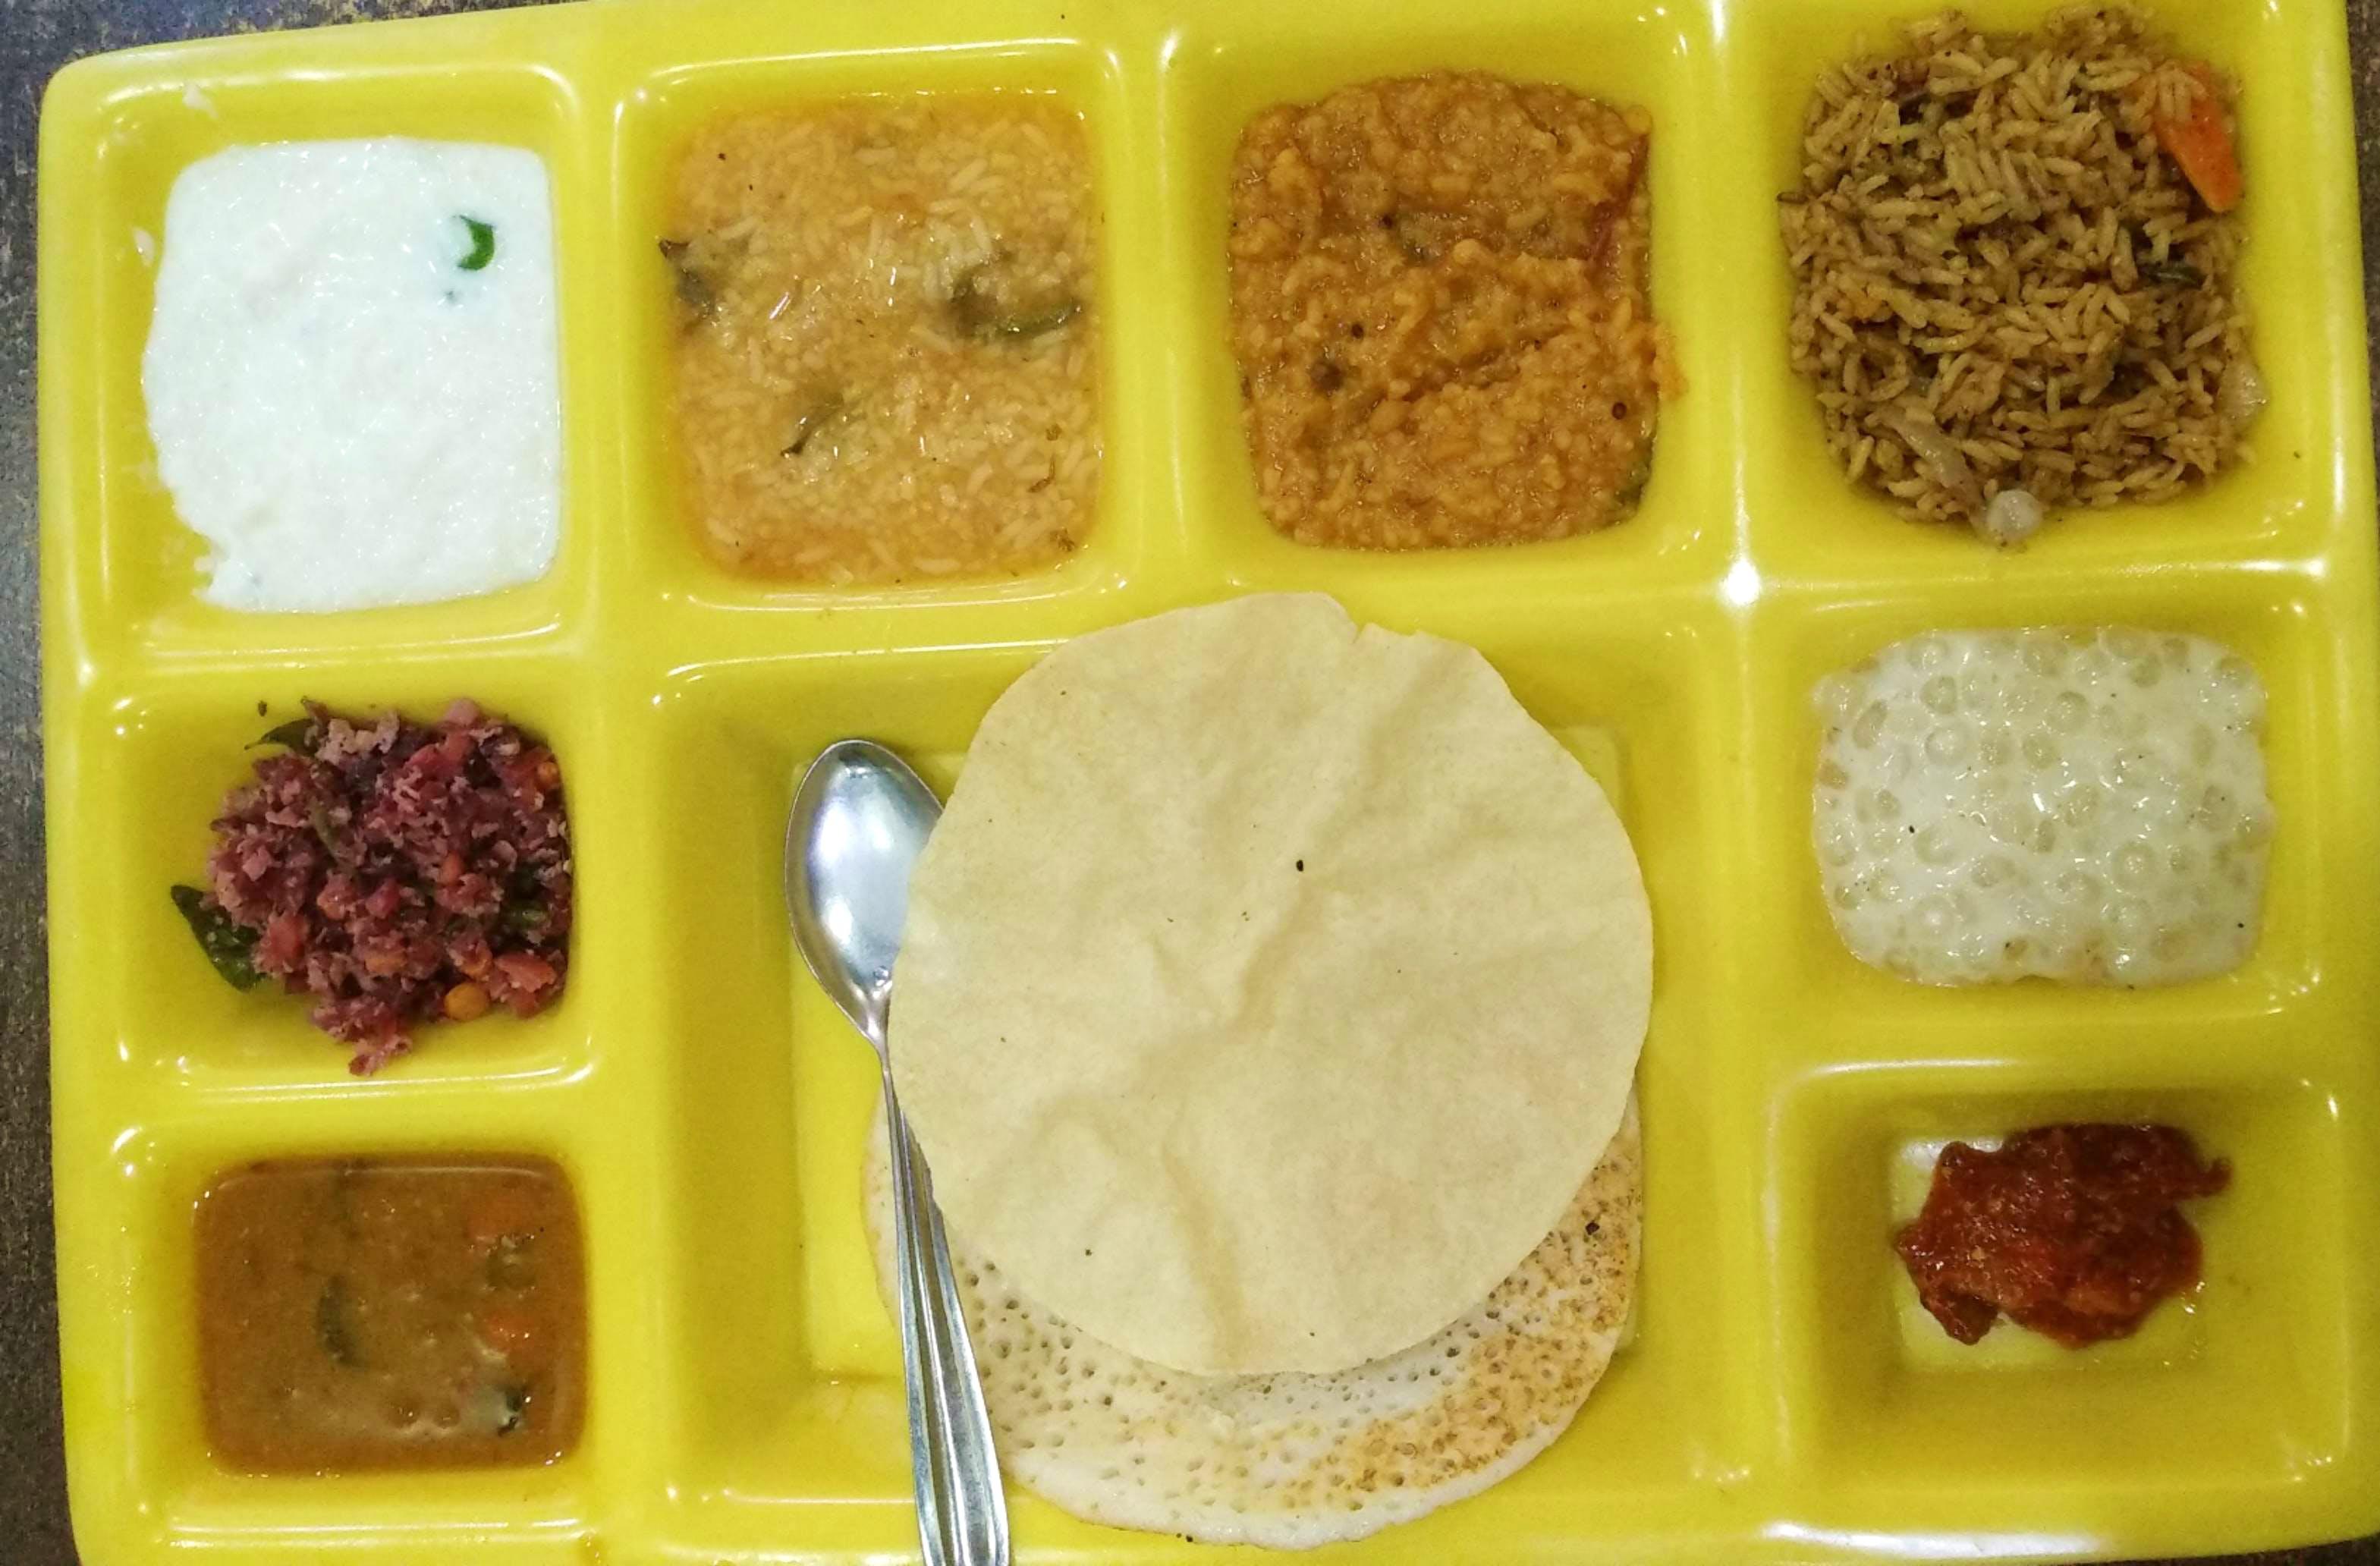 Food,Cuisine,Dish,Lunch,Ingredient,Comfort food,Meal,Tteok,Vegetarian food,Meal, ready-to-eat